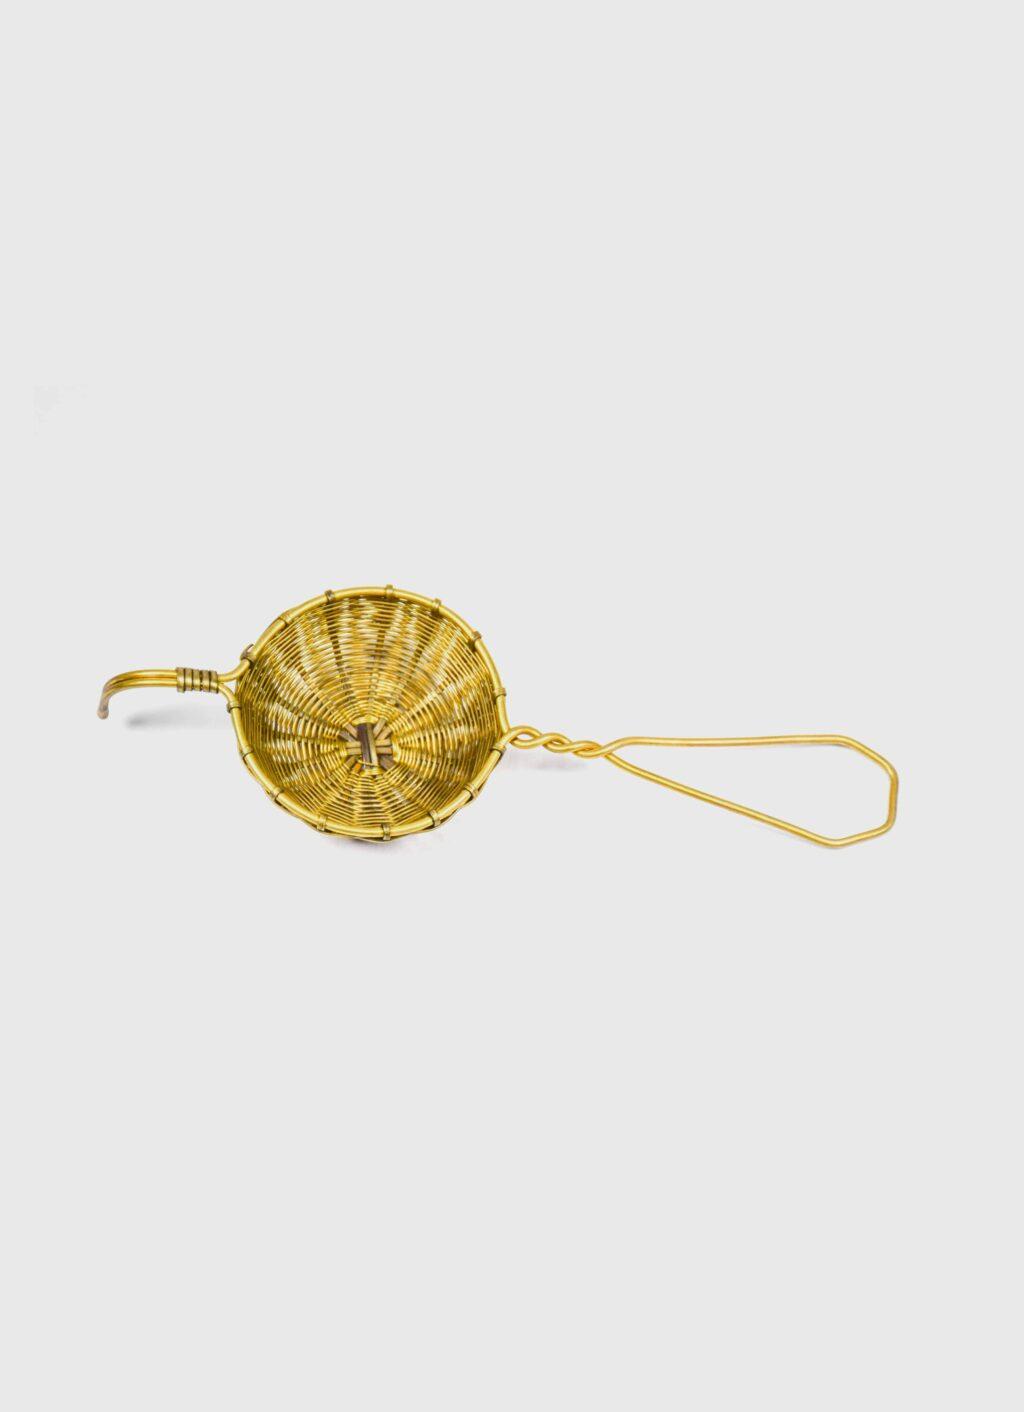 Bellocq - Tea Strainer - Petite Basket - Brass